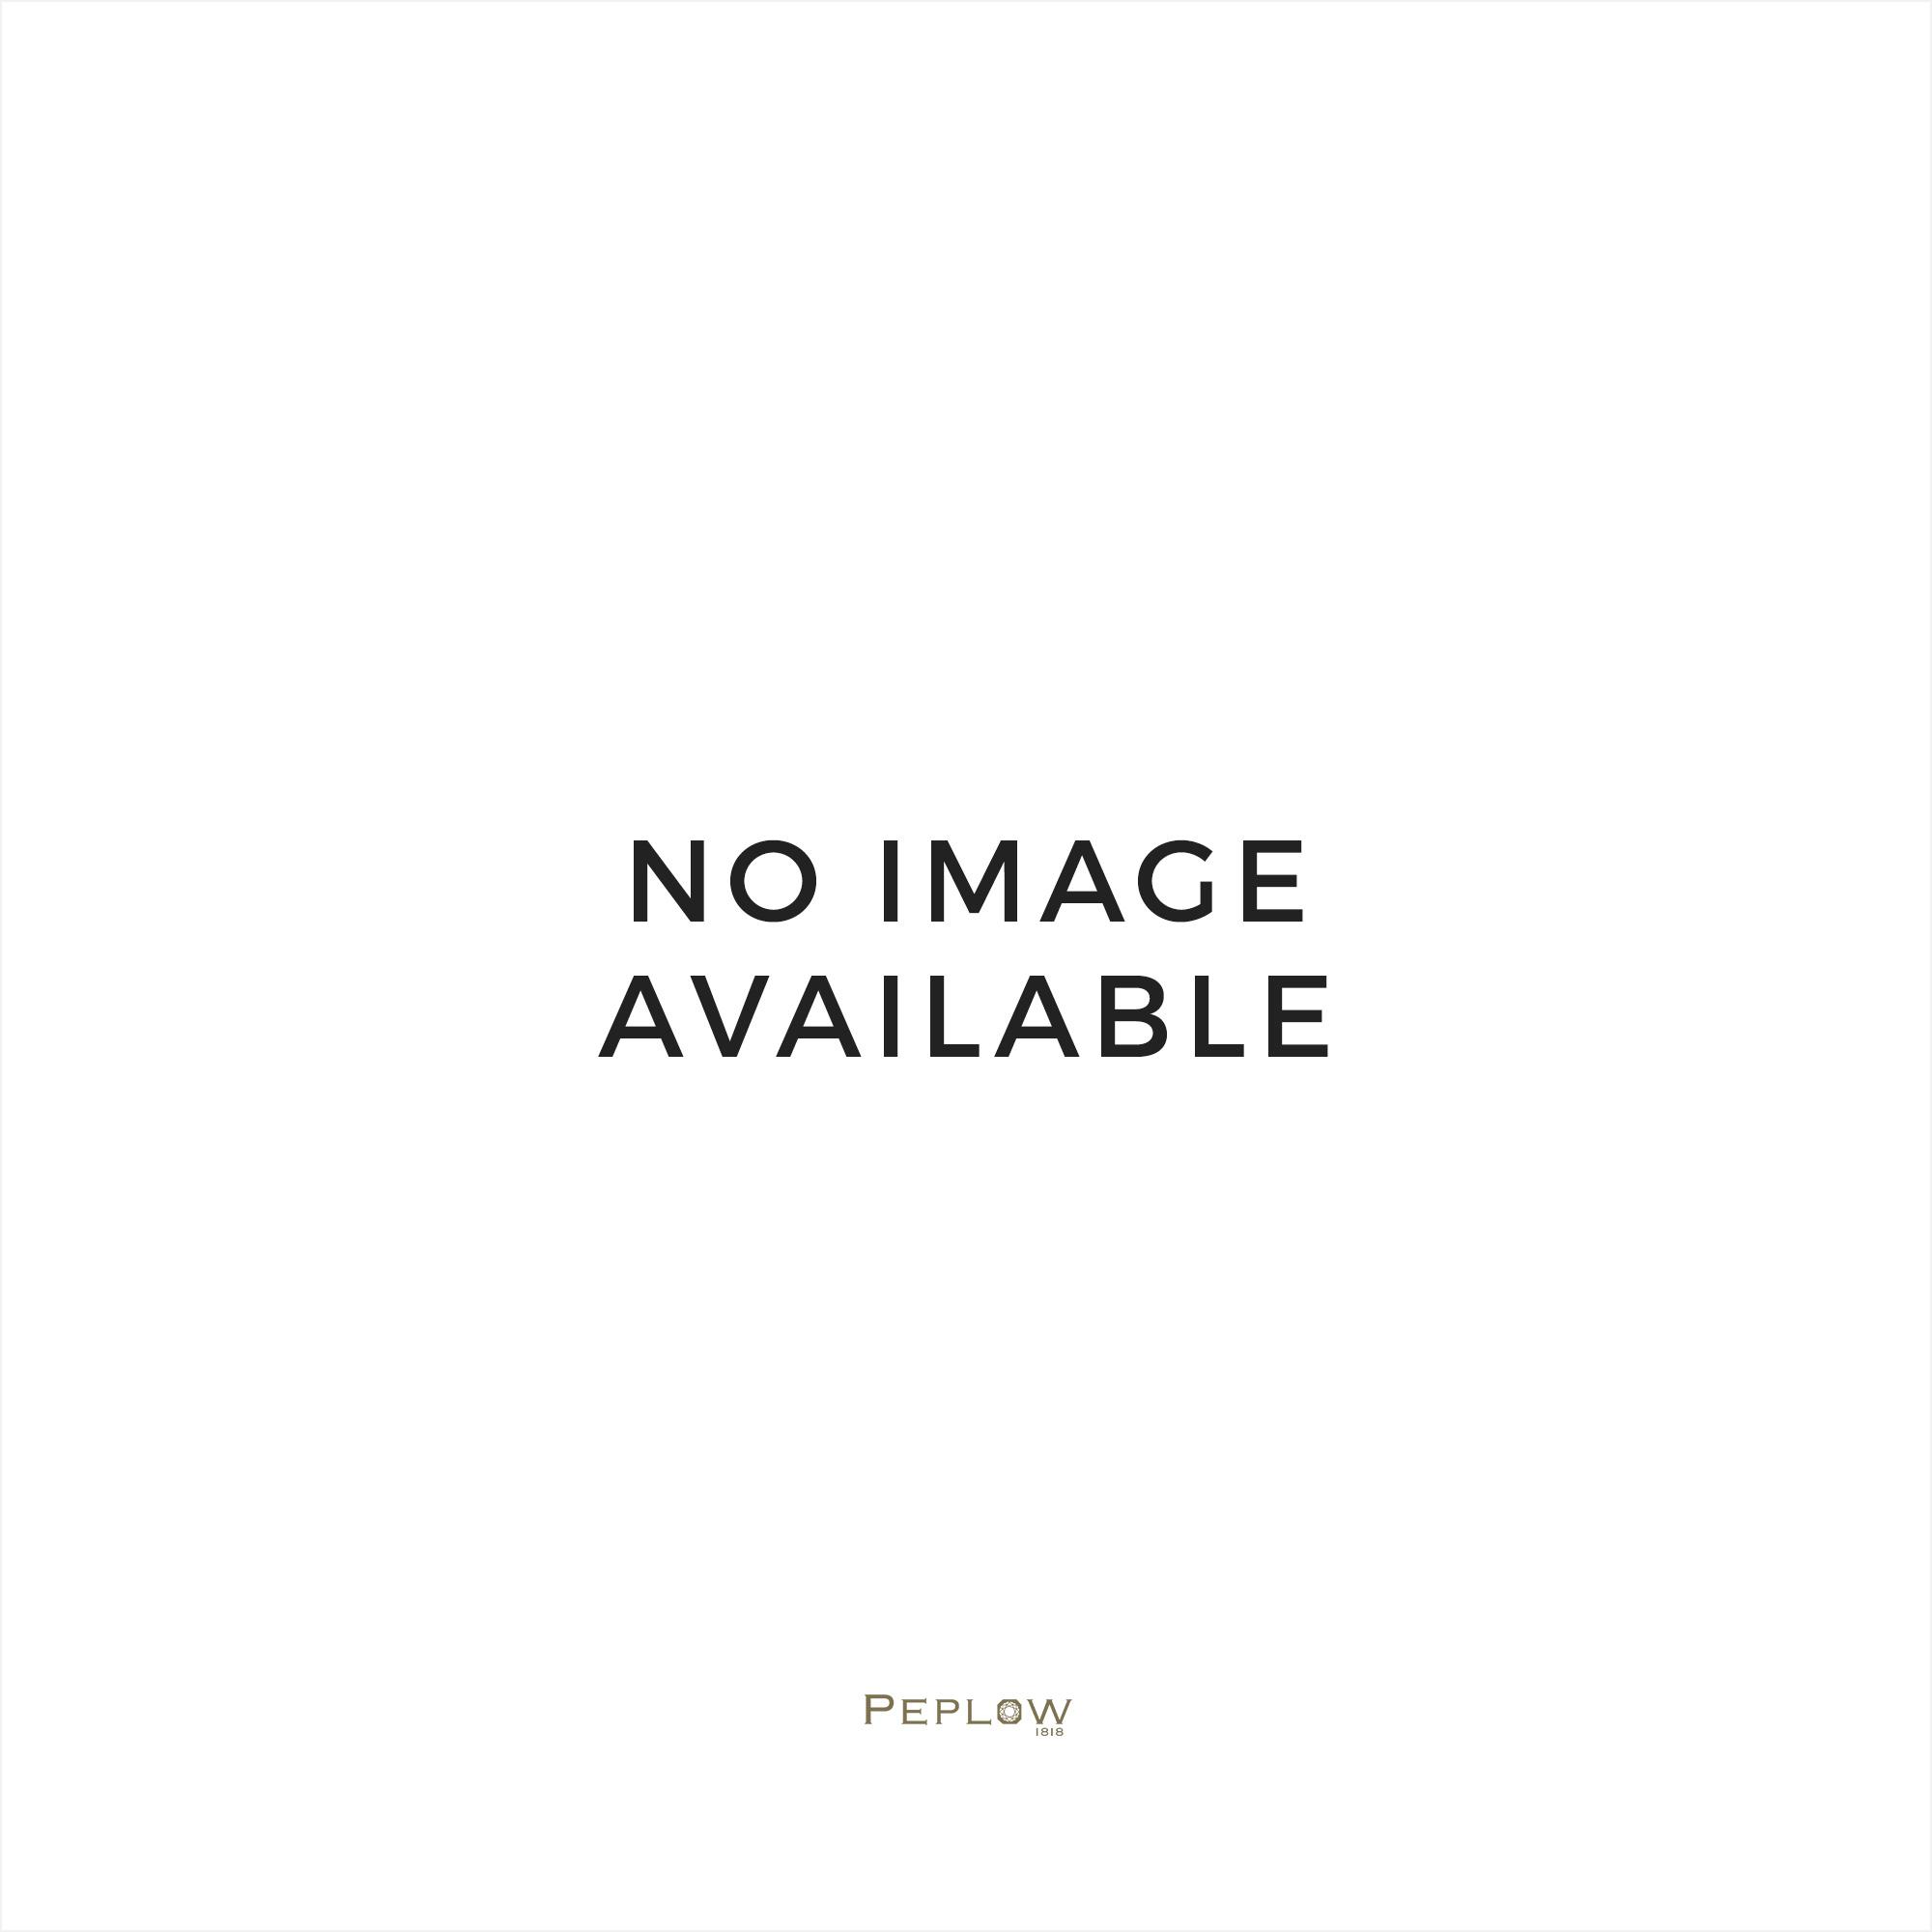 Gents Michel Herbelin Newport Connect bluetooth watch GC/15CB